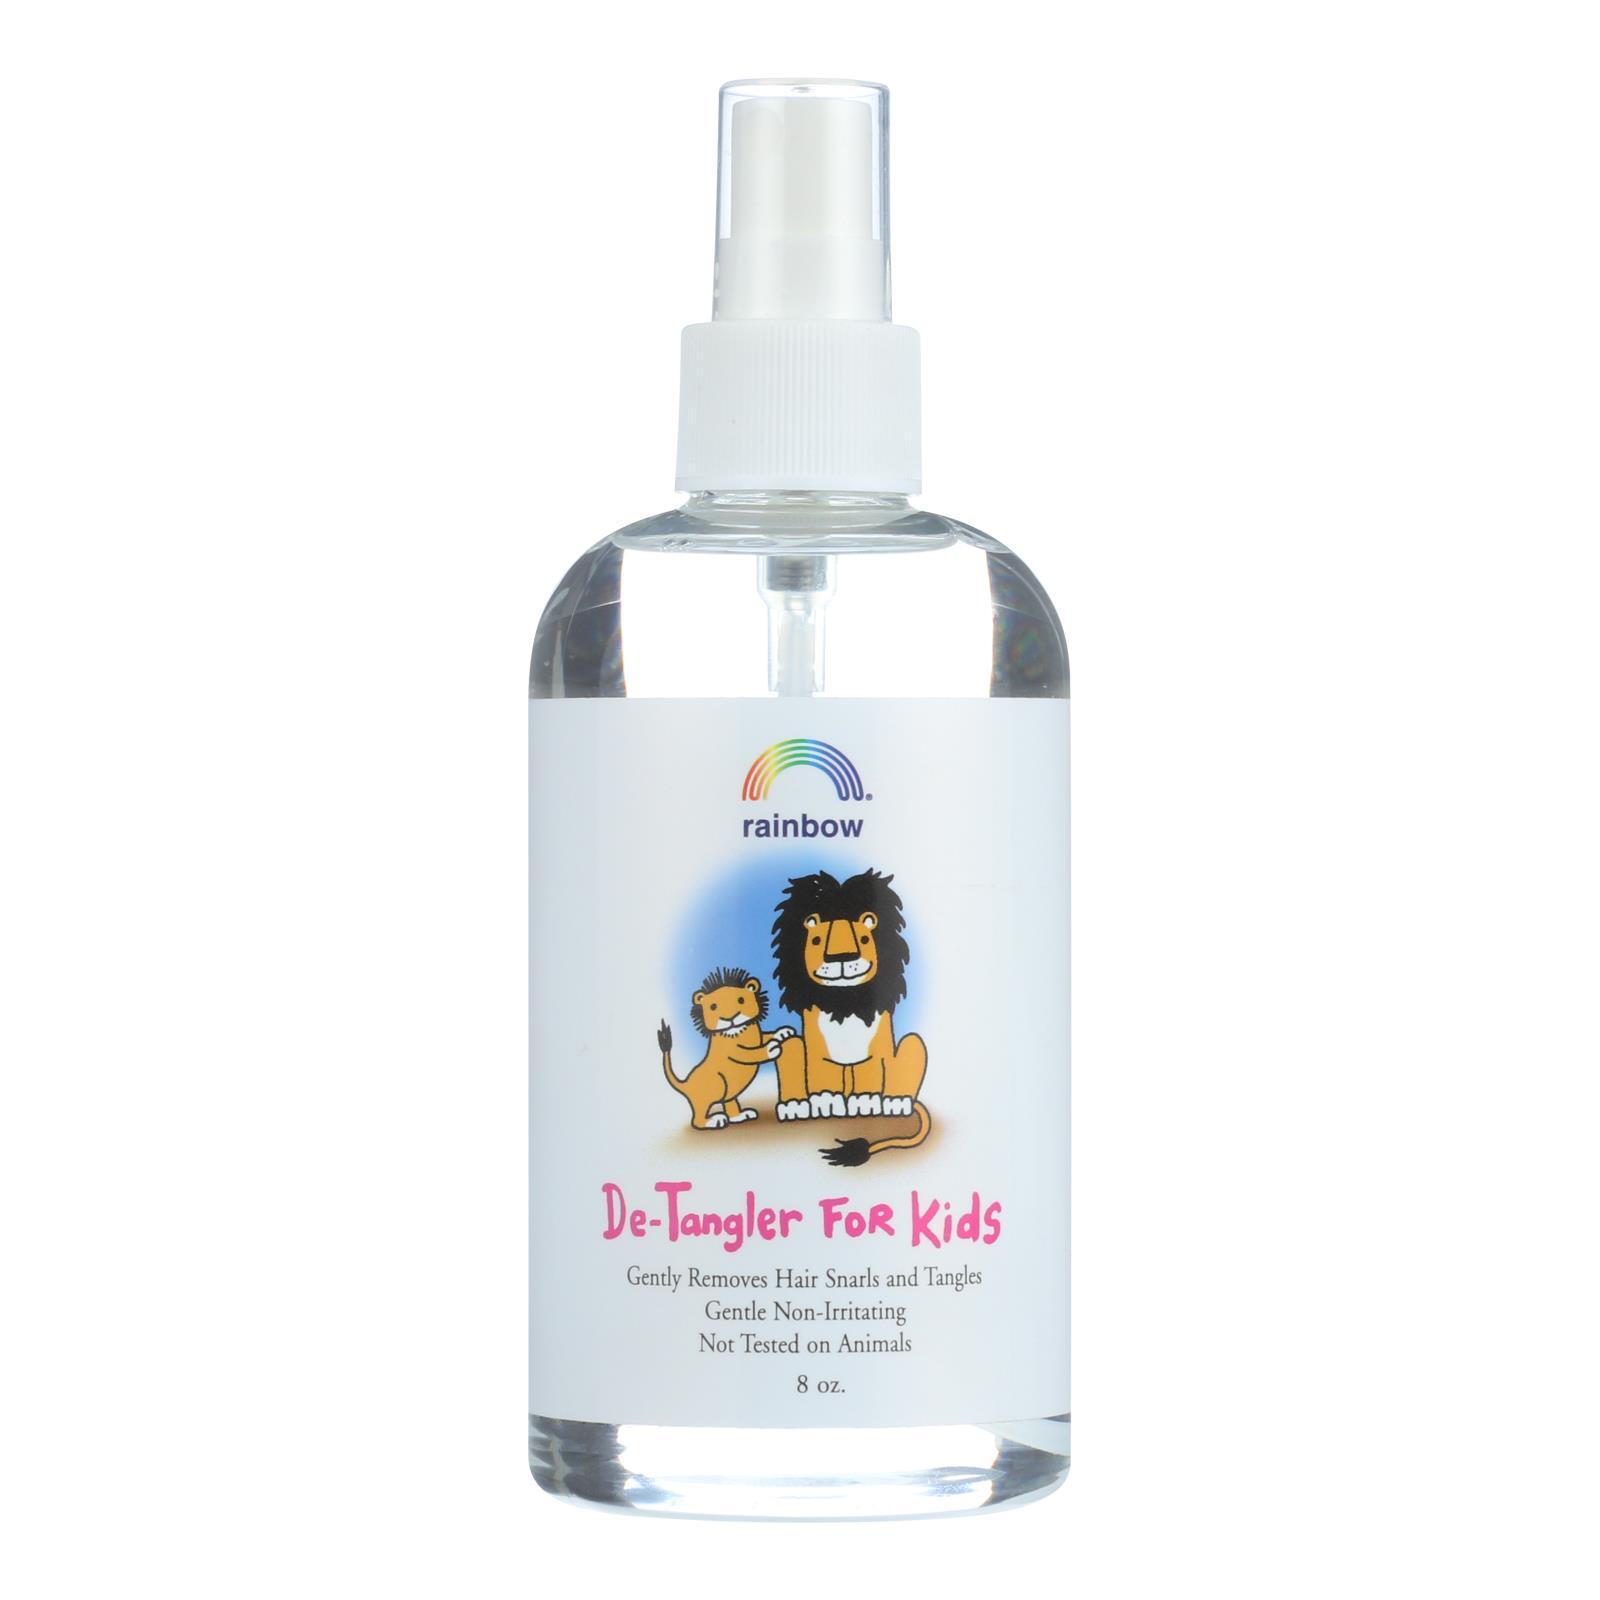 Rainbow Research Spray De-Tangler For Kids Original Scent - 8 fl oz